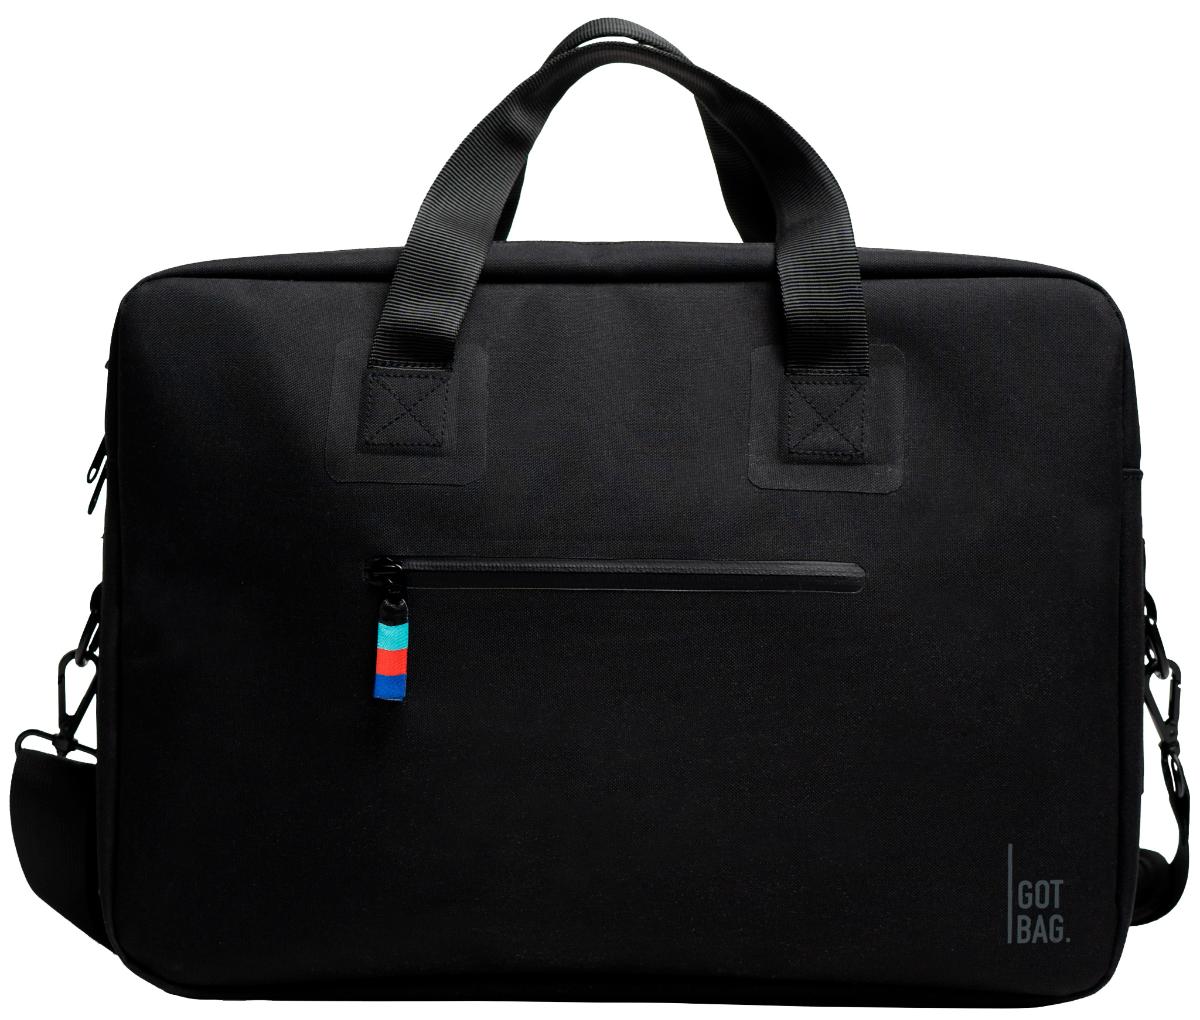 Business Bag 15 Zoll 8,8 Liter - Black